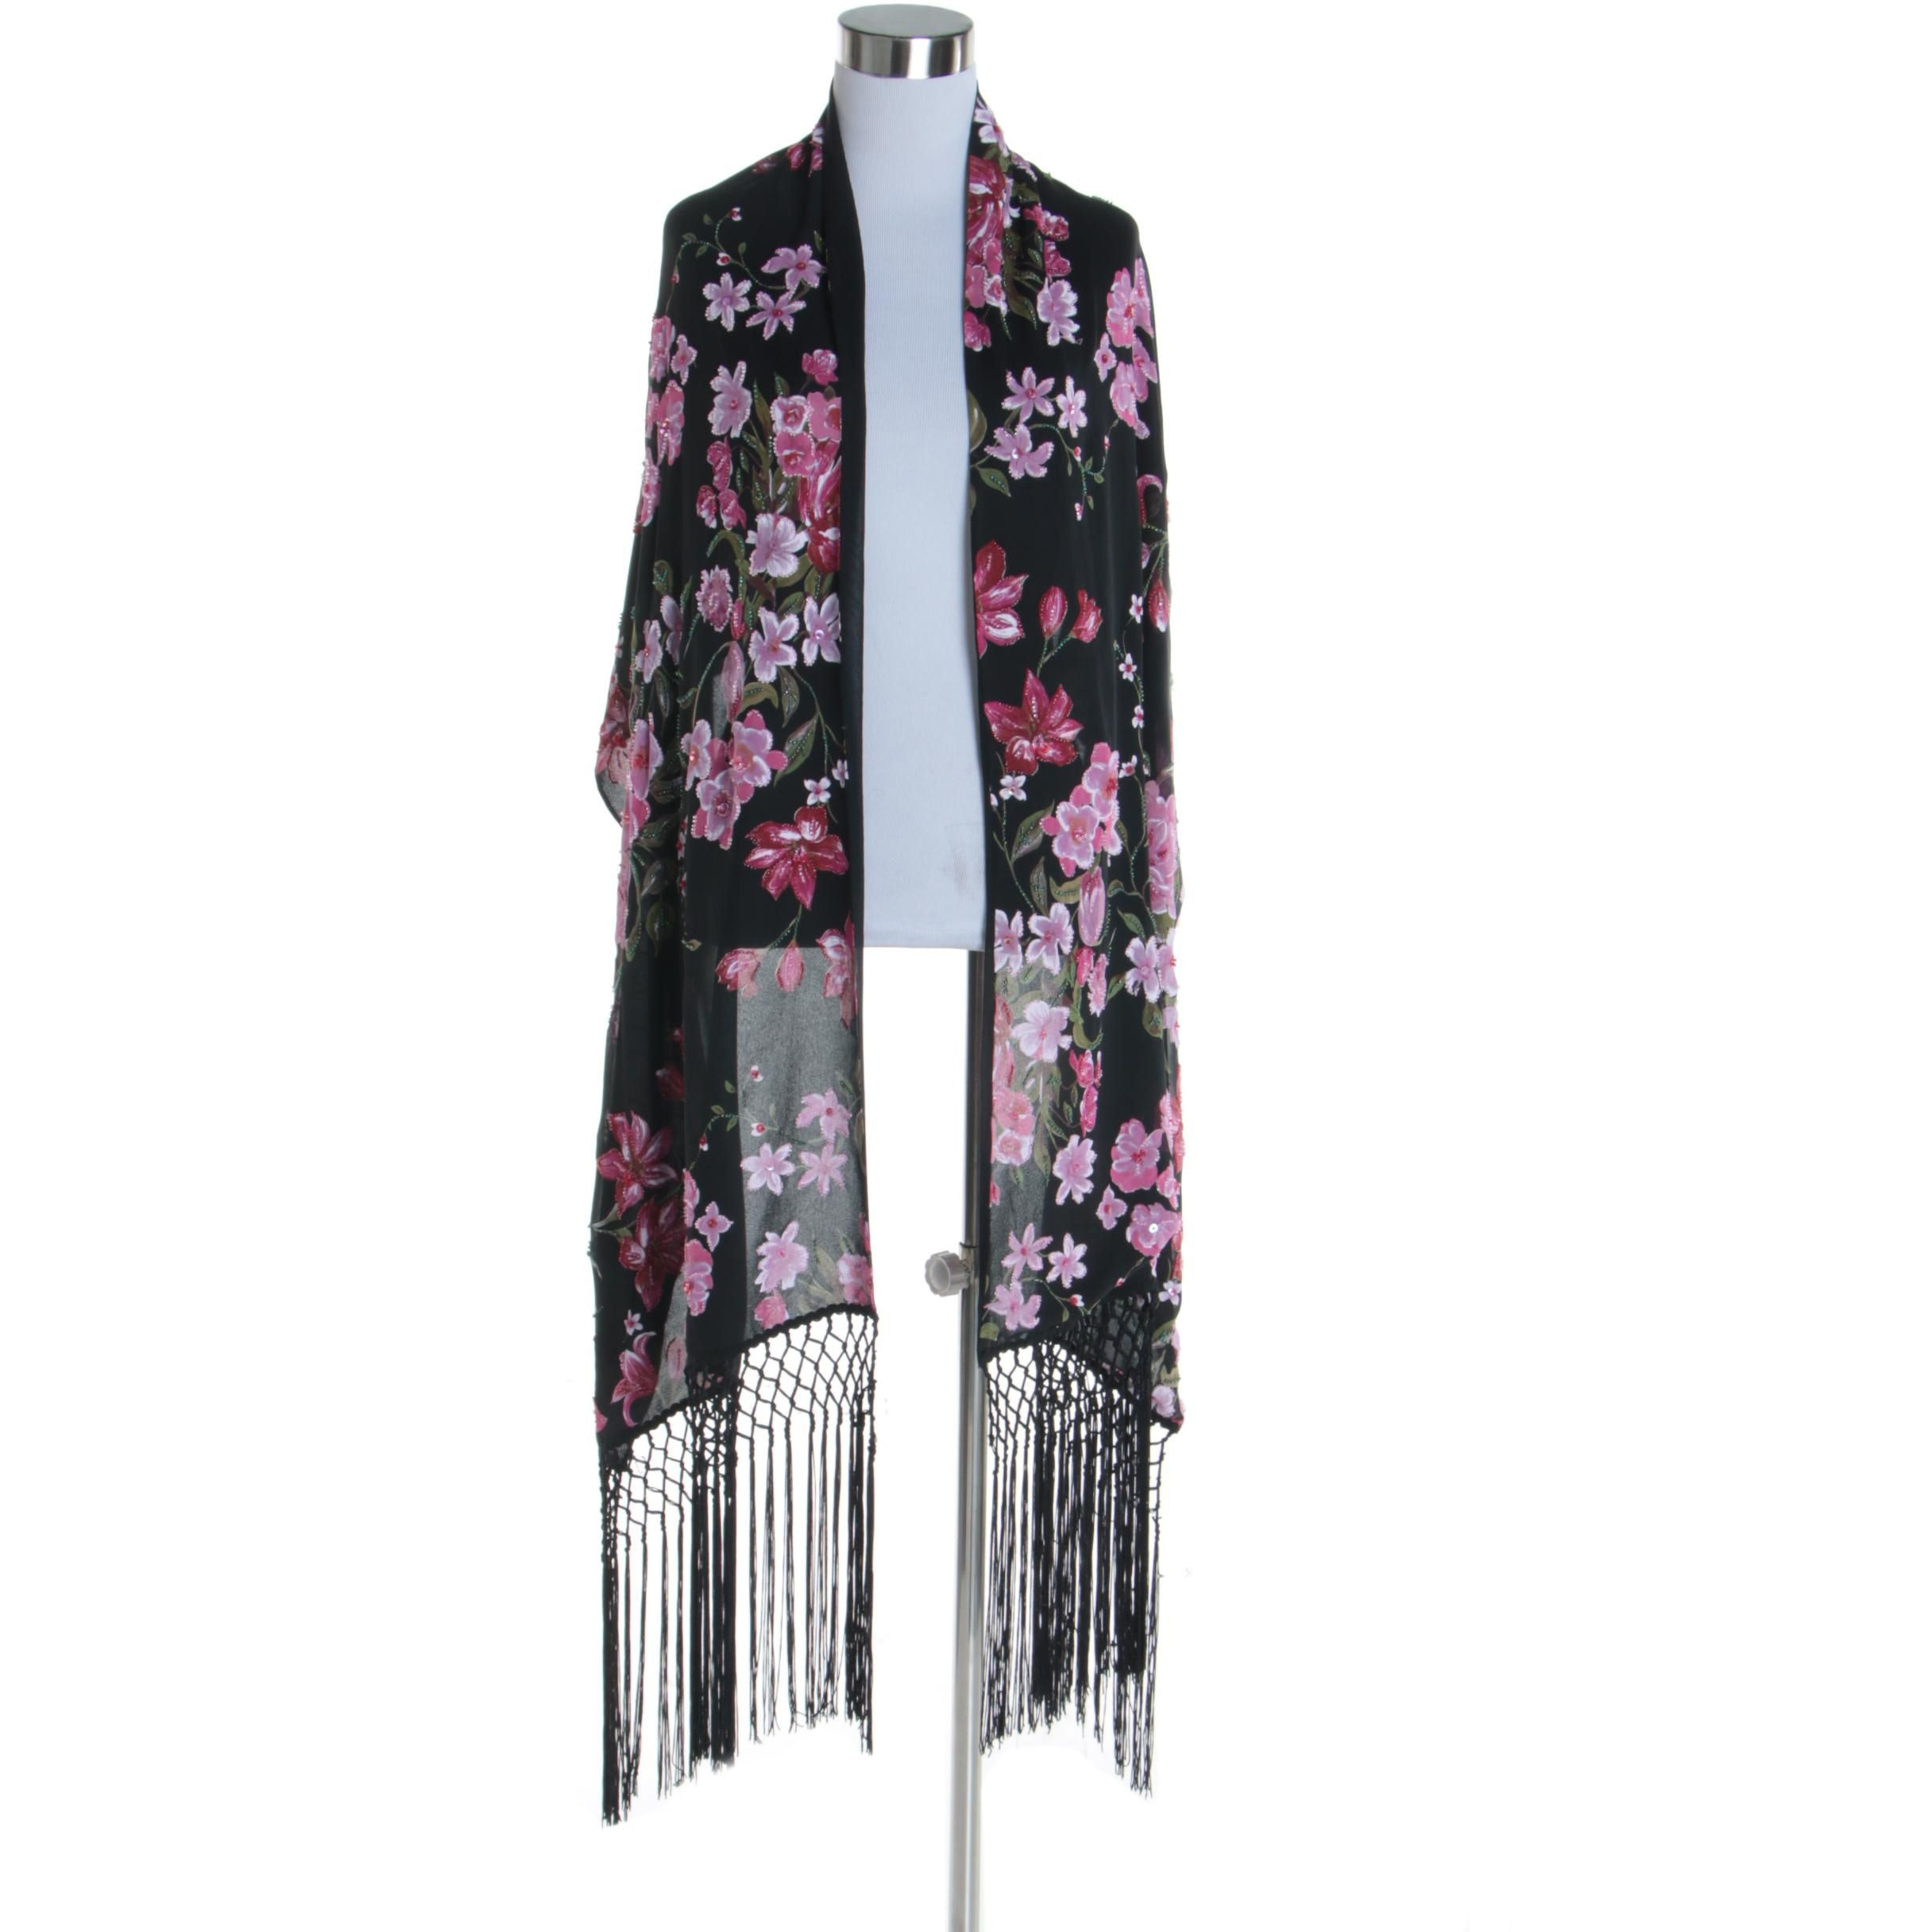 Women's Black Poly-Blend Floral Embellished Wrap with Hand-Knotted Fringe